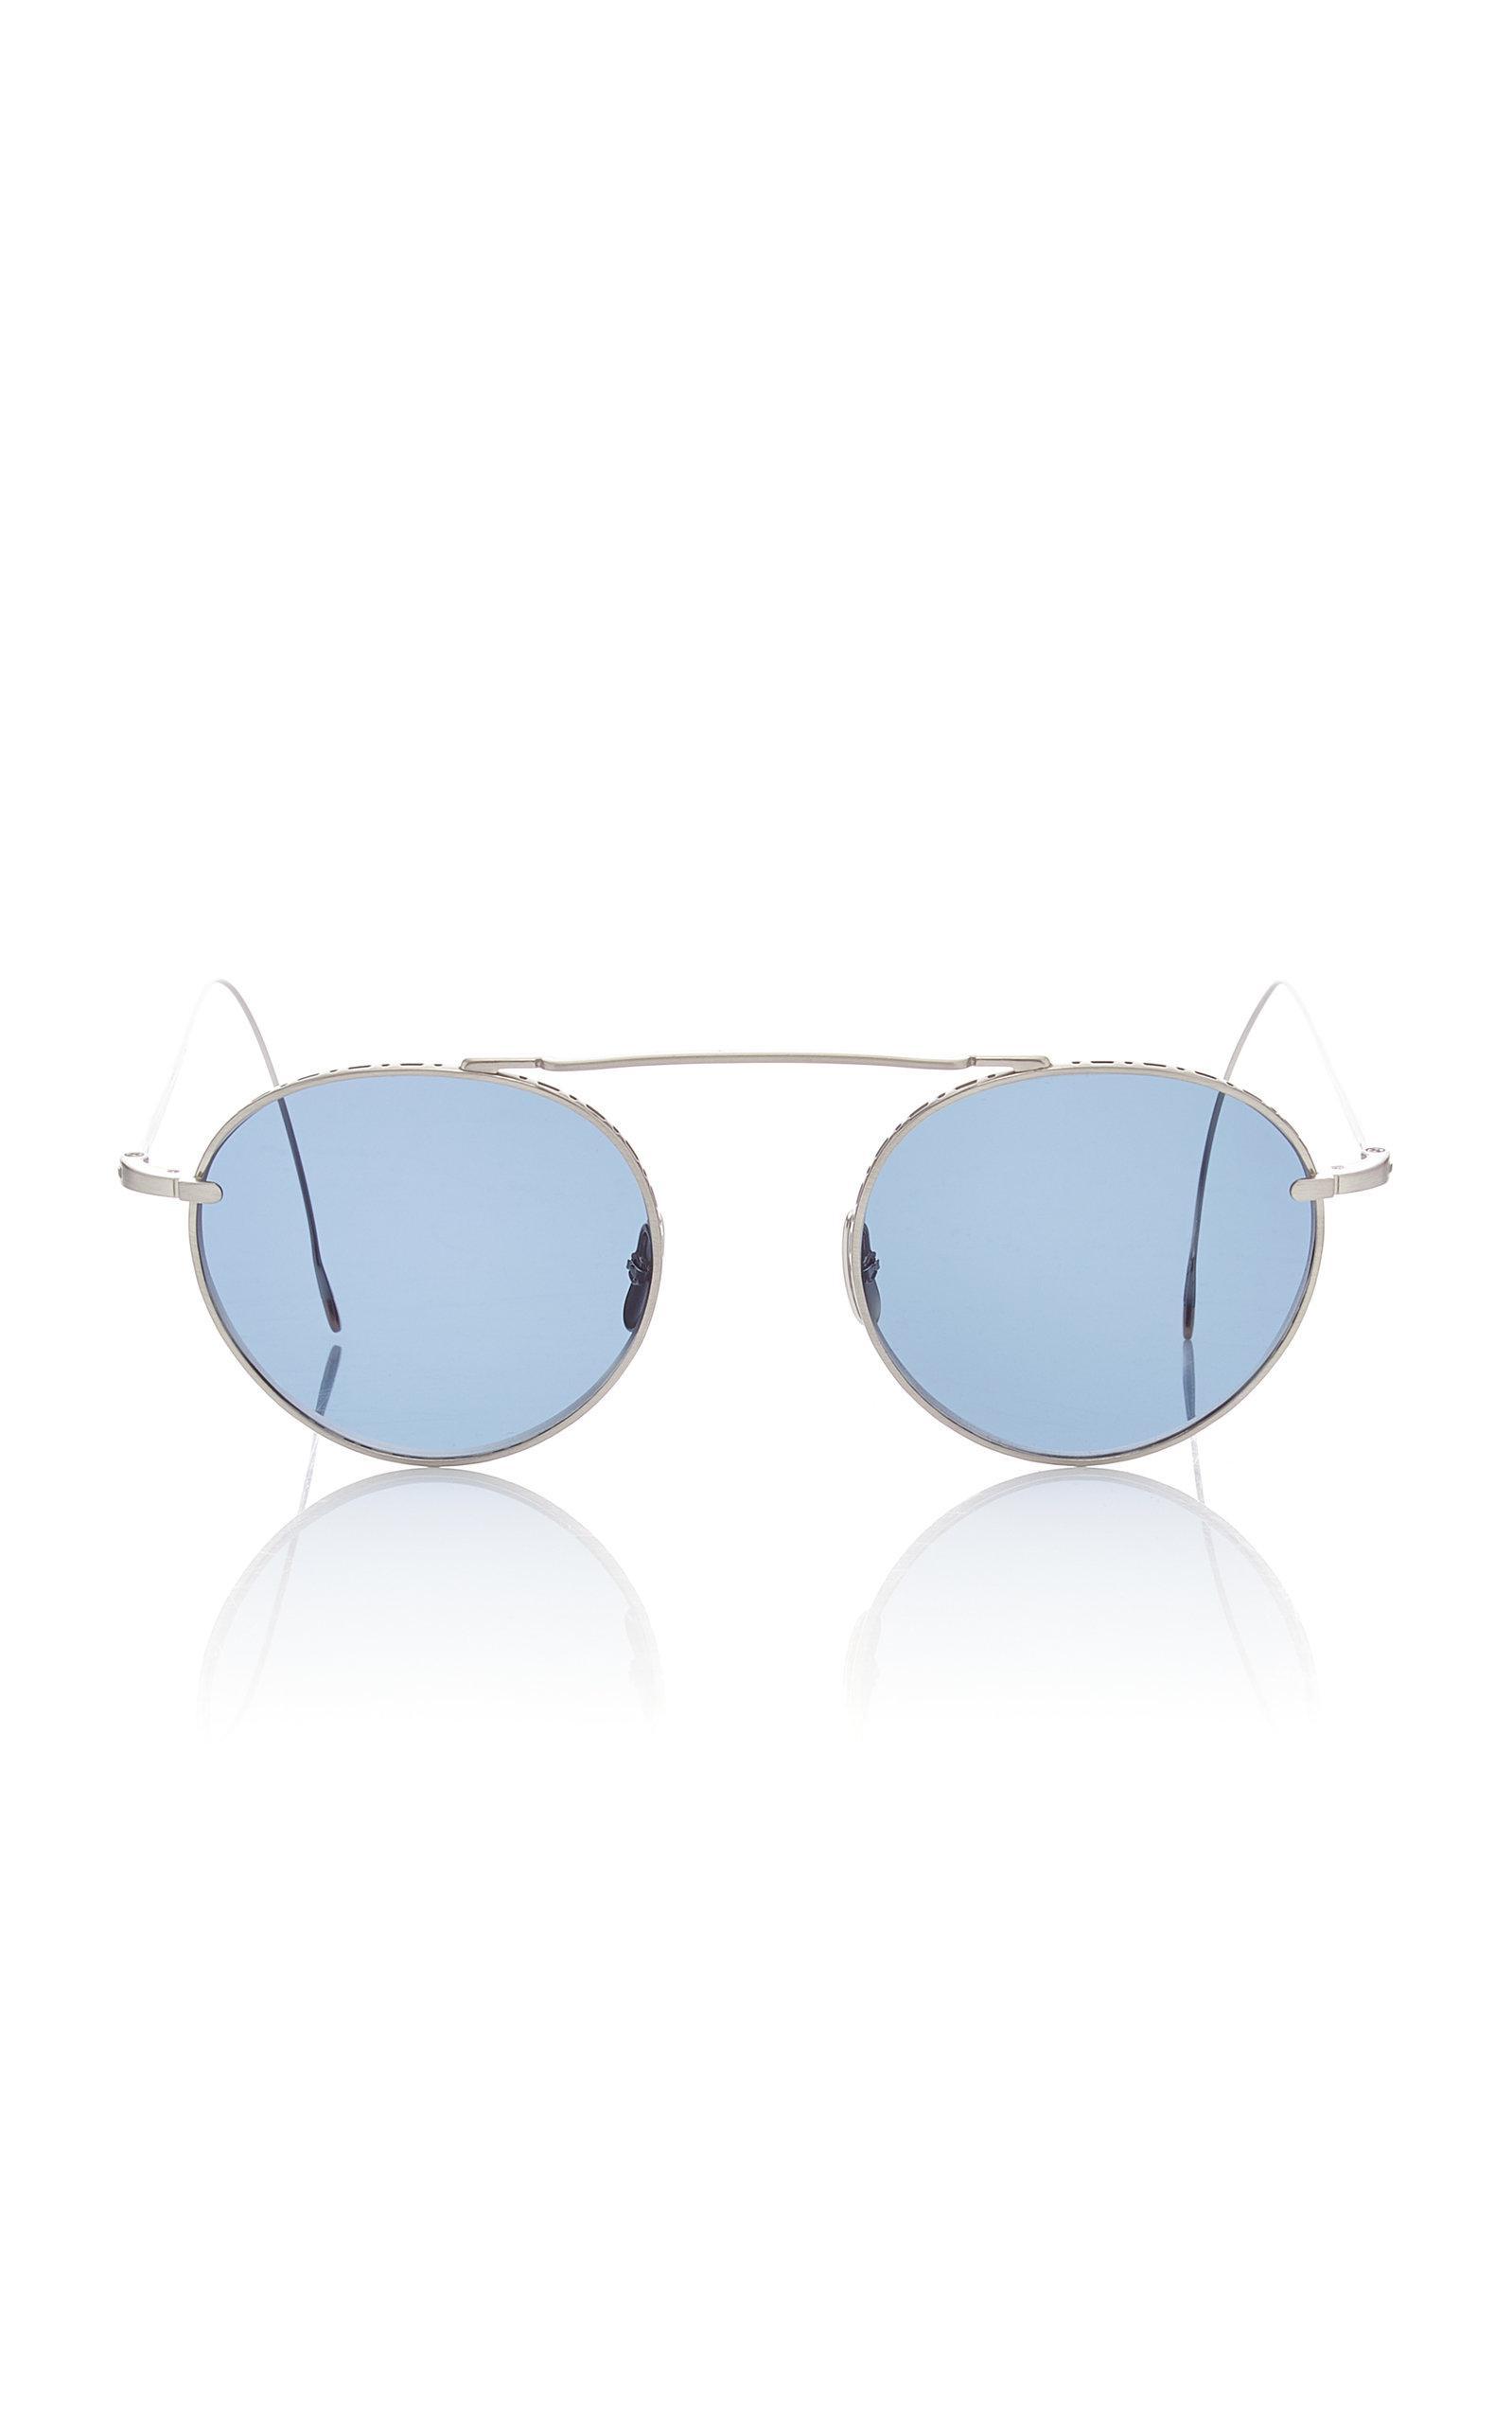 bb7fa21e0e7a80 Lyst - Mr. Leight Rei 49 Aviator-style Titanium Sunglasses in Blue